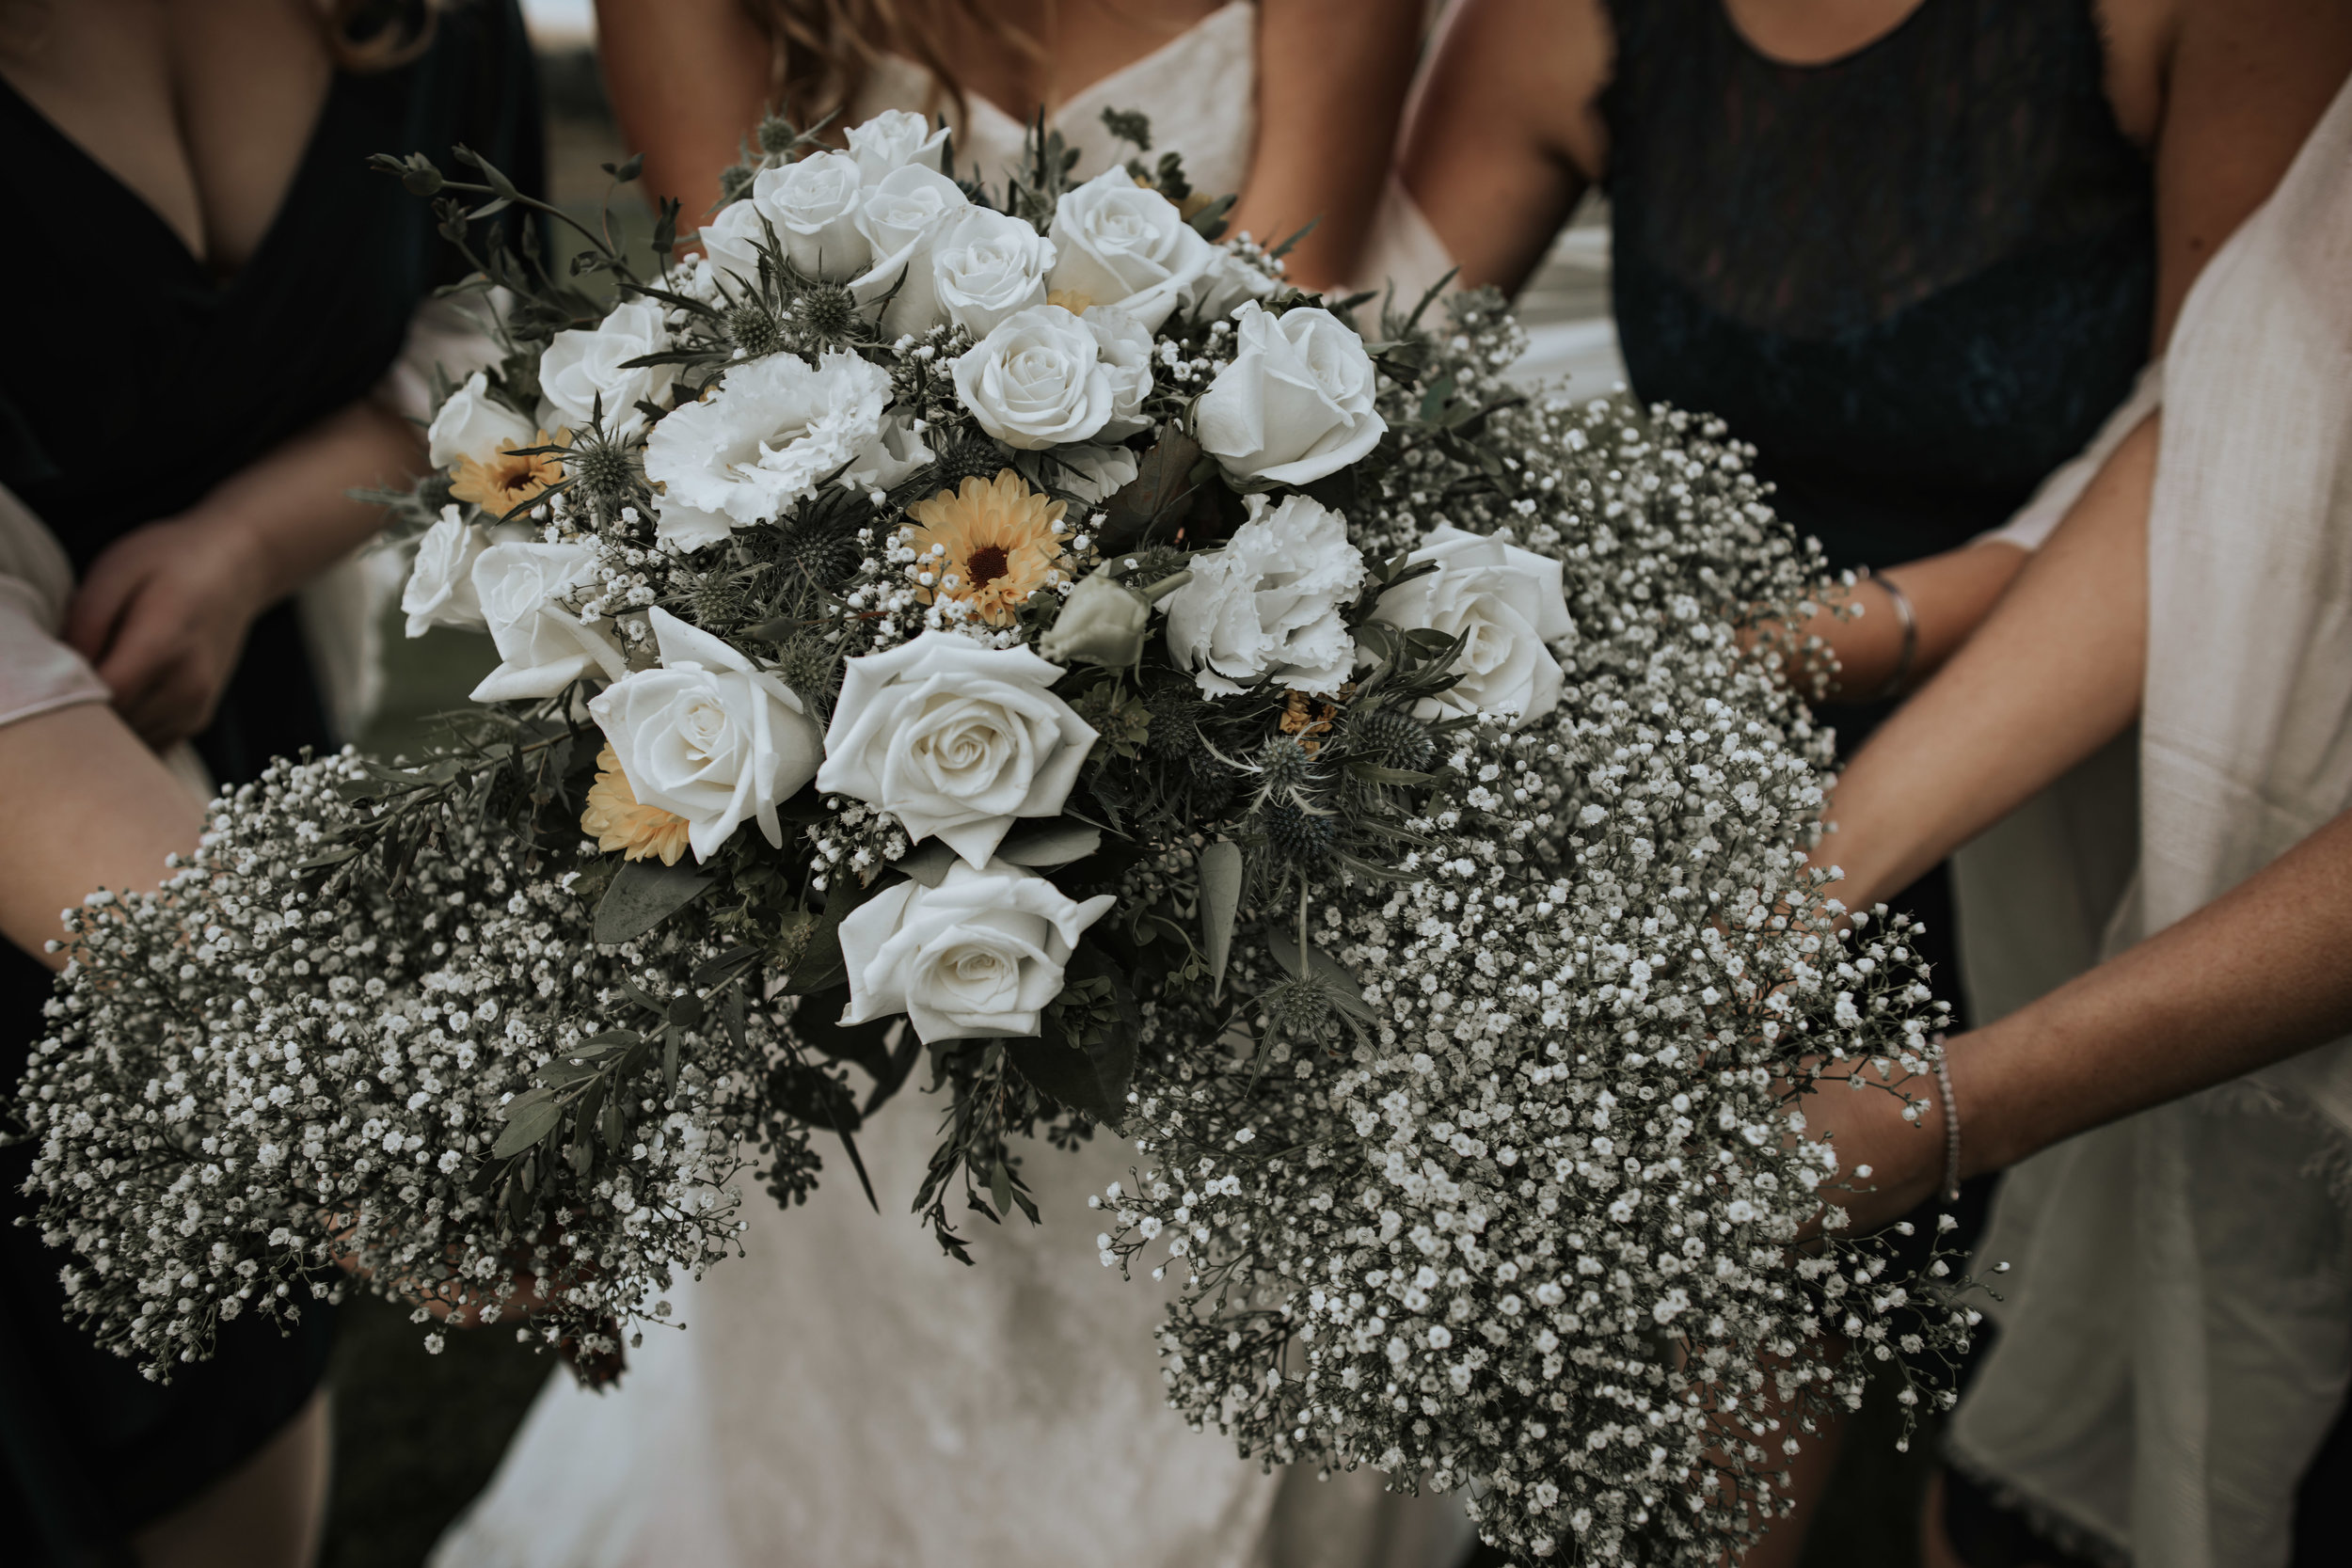 Vermont Wedding | Lorianna Weathers Photography-0888.jpg